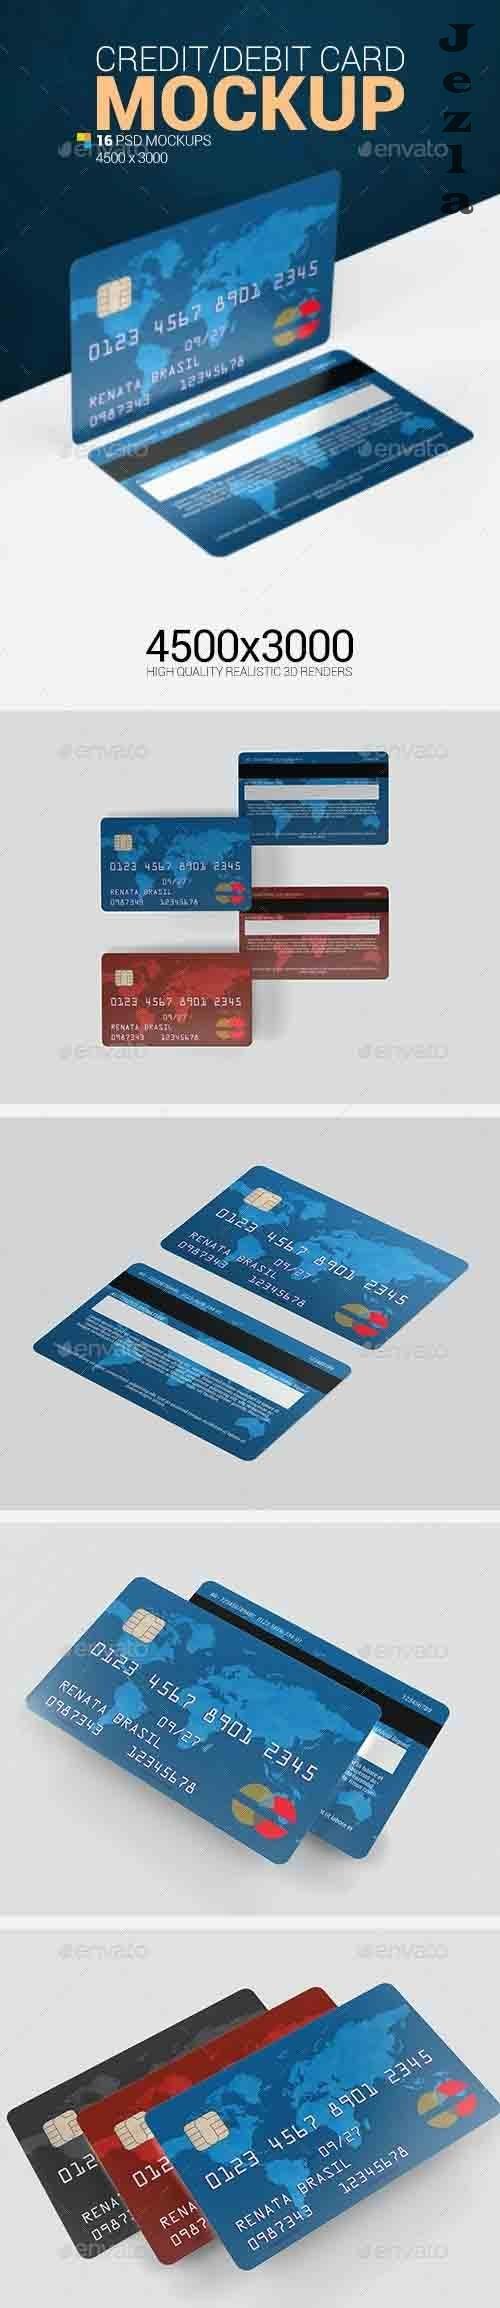 Credit Debit Card Mockup 25488294